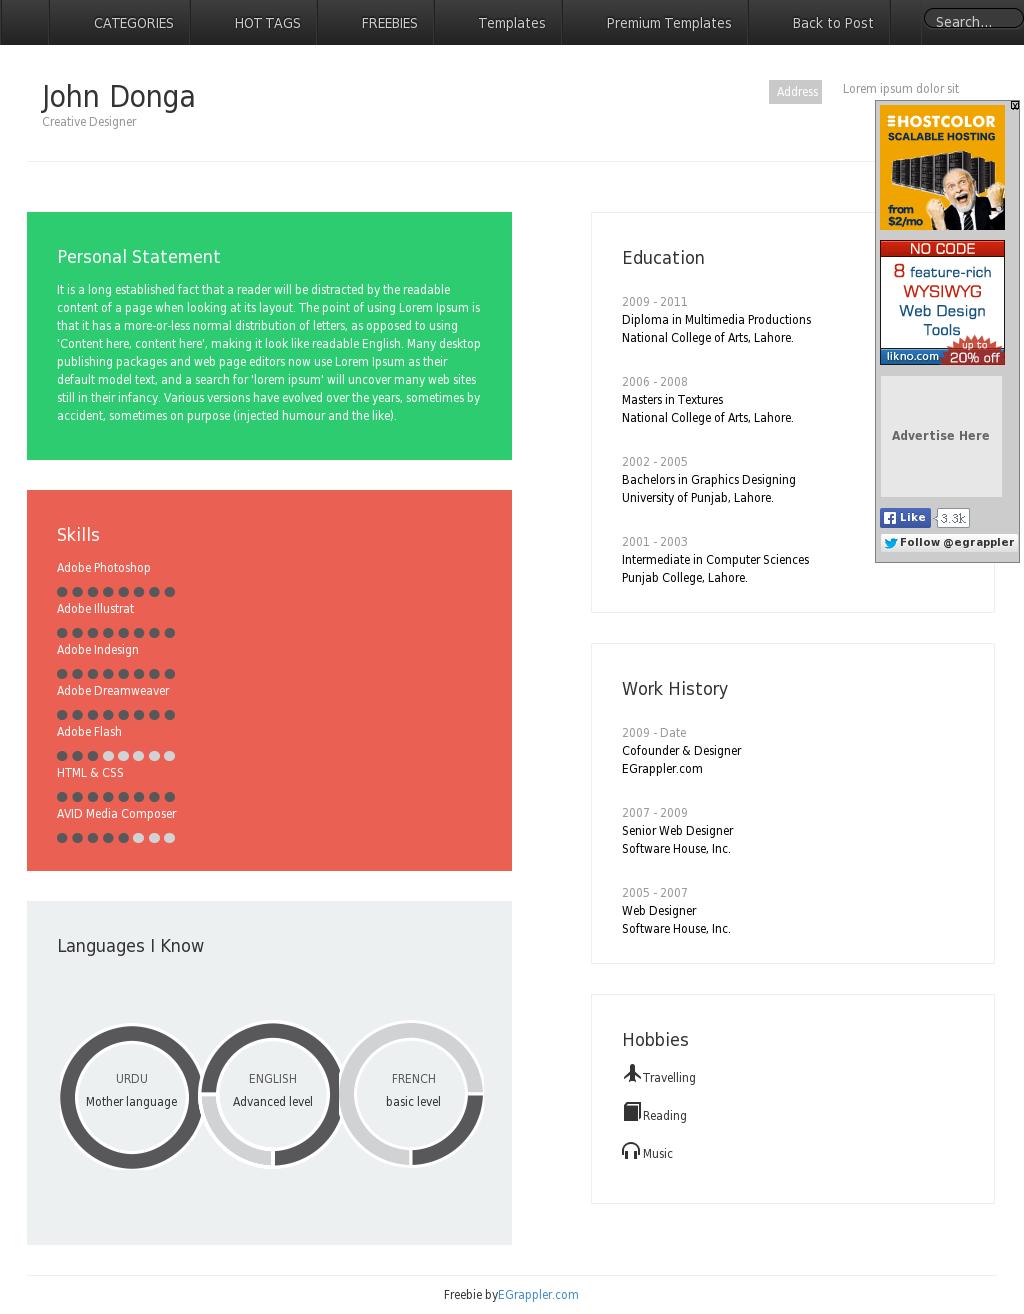 Responsive Resume Template Built Using Twitter Bootstrap 3 ...